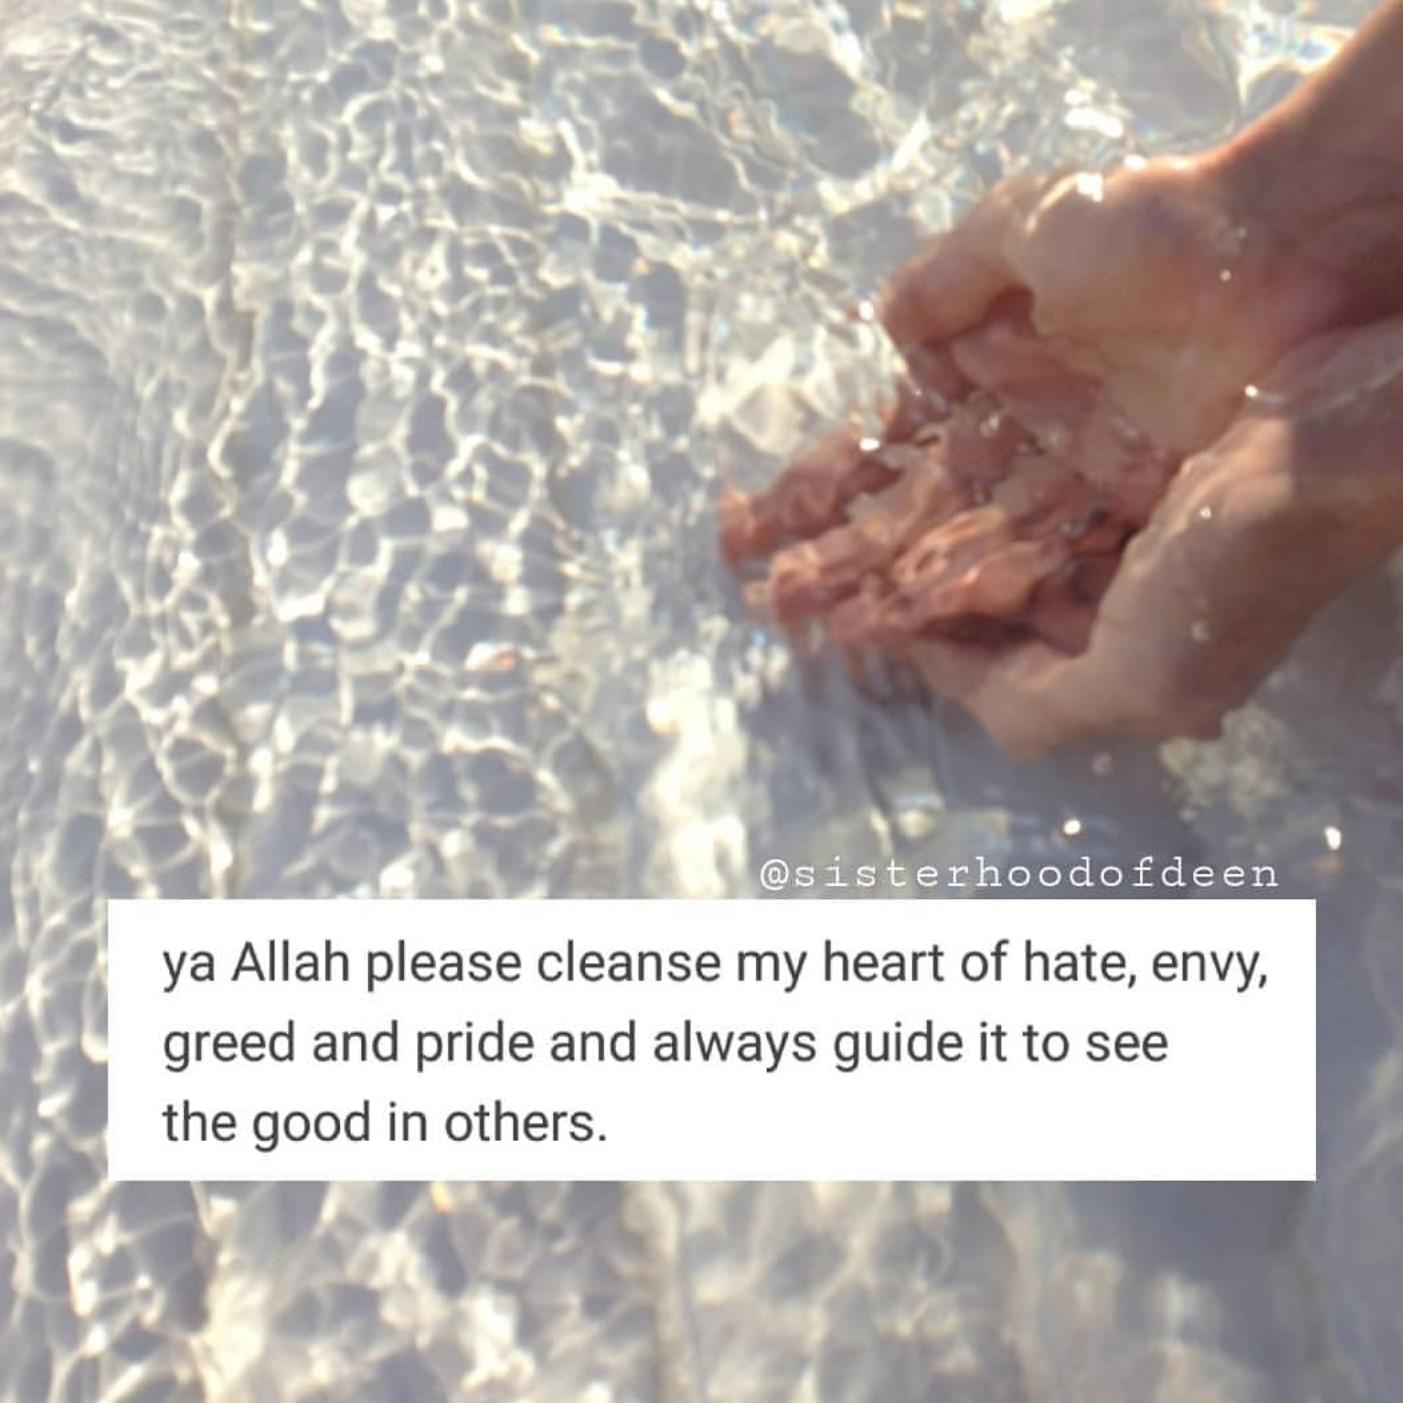 الحمدلله   Beautiful Reminders   Islamic quotes, Islam, Allah